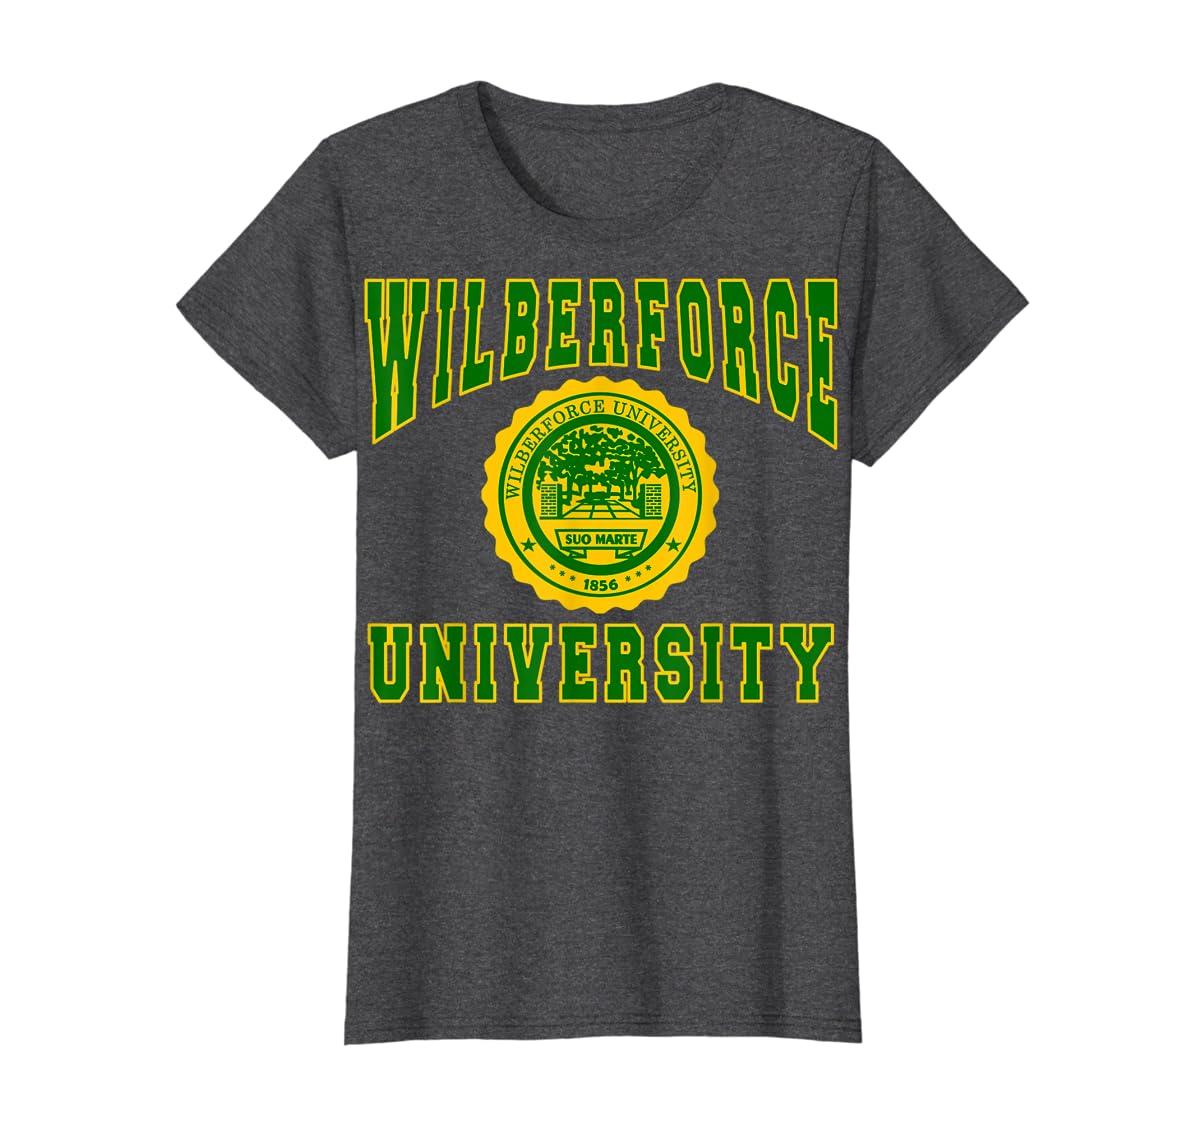 Wilberforce 1856 University Apparel - T shirt-Women's T-Shirt-Dark Heather